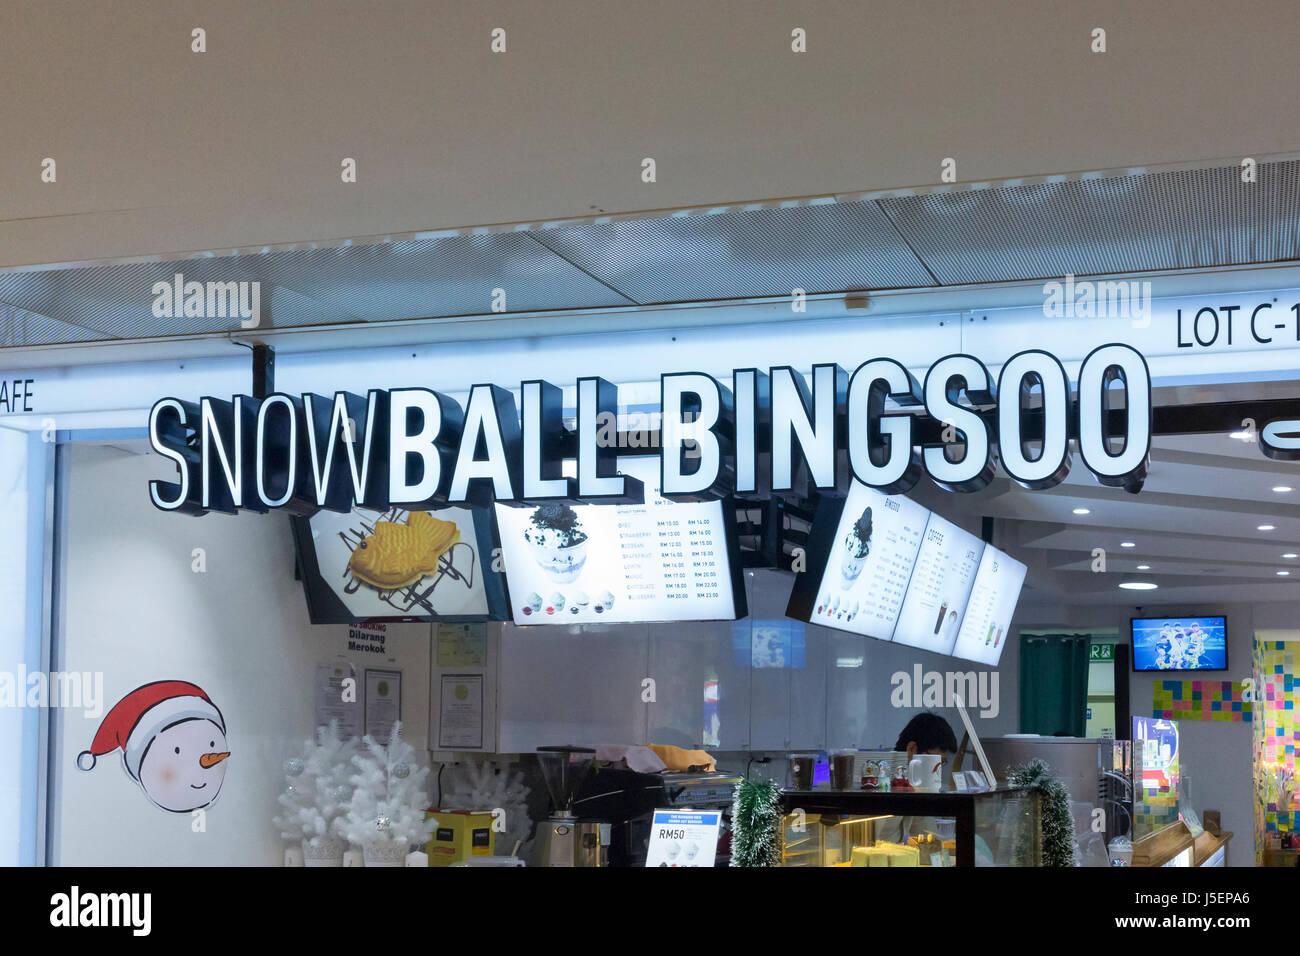 Snowball bingsoo shop, Kuala Lumpur, Malaysia - Stock Image